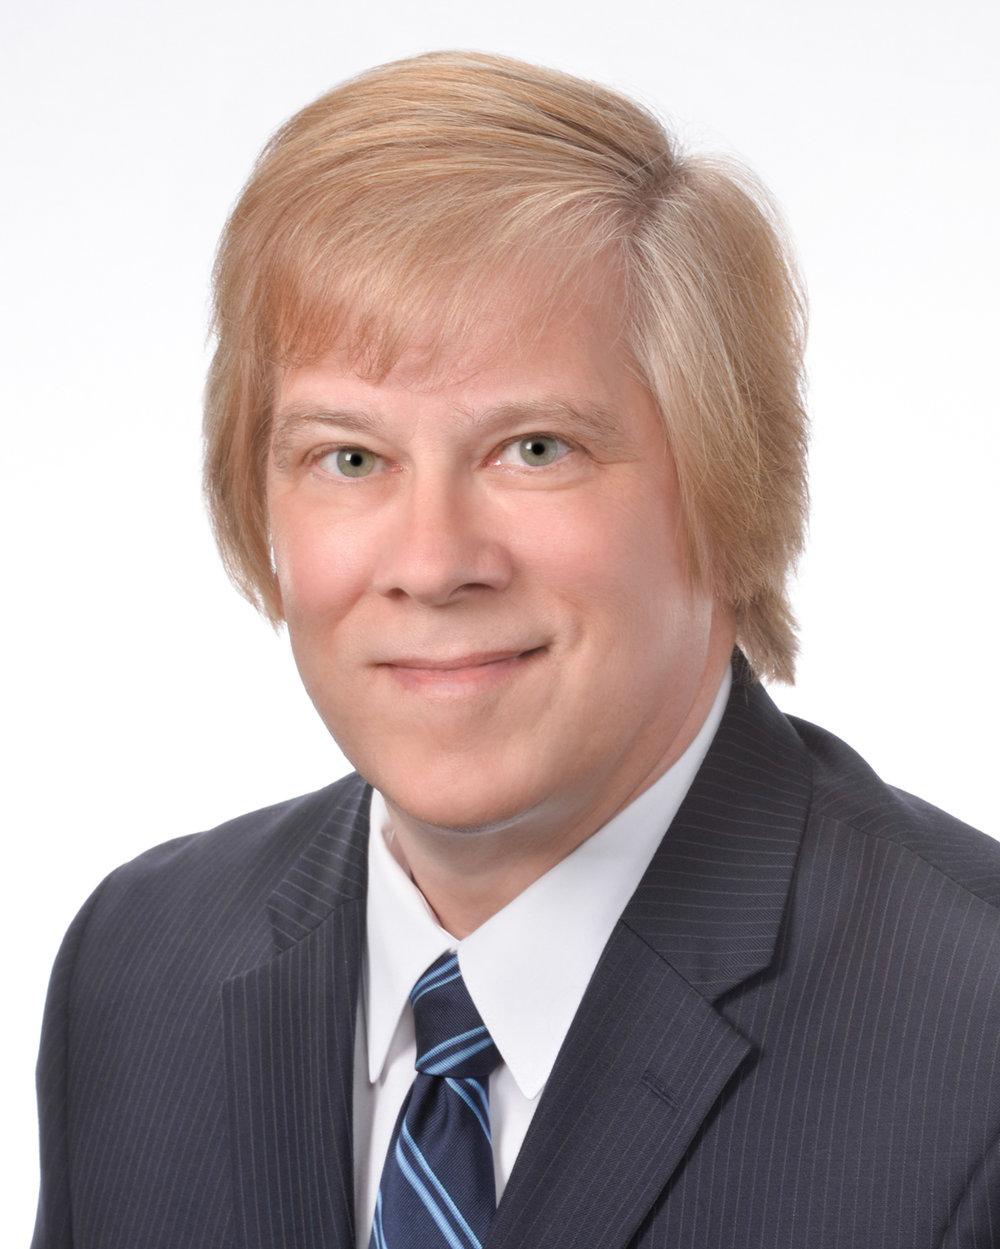 Todd A. Richardson - Director